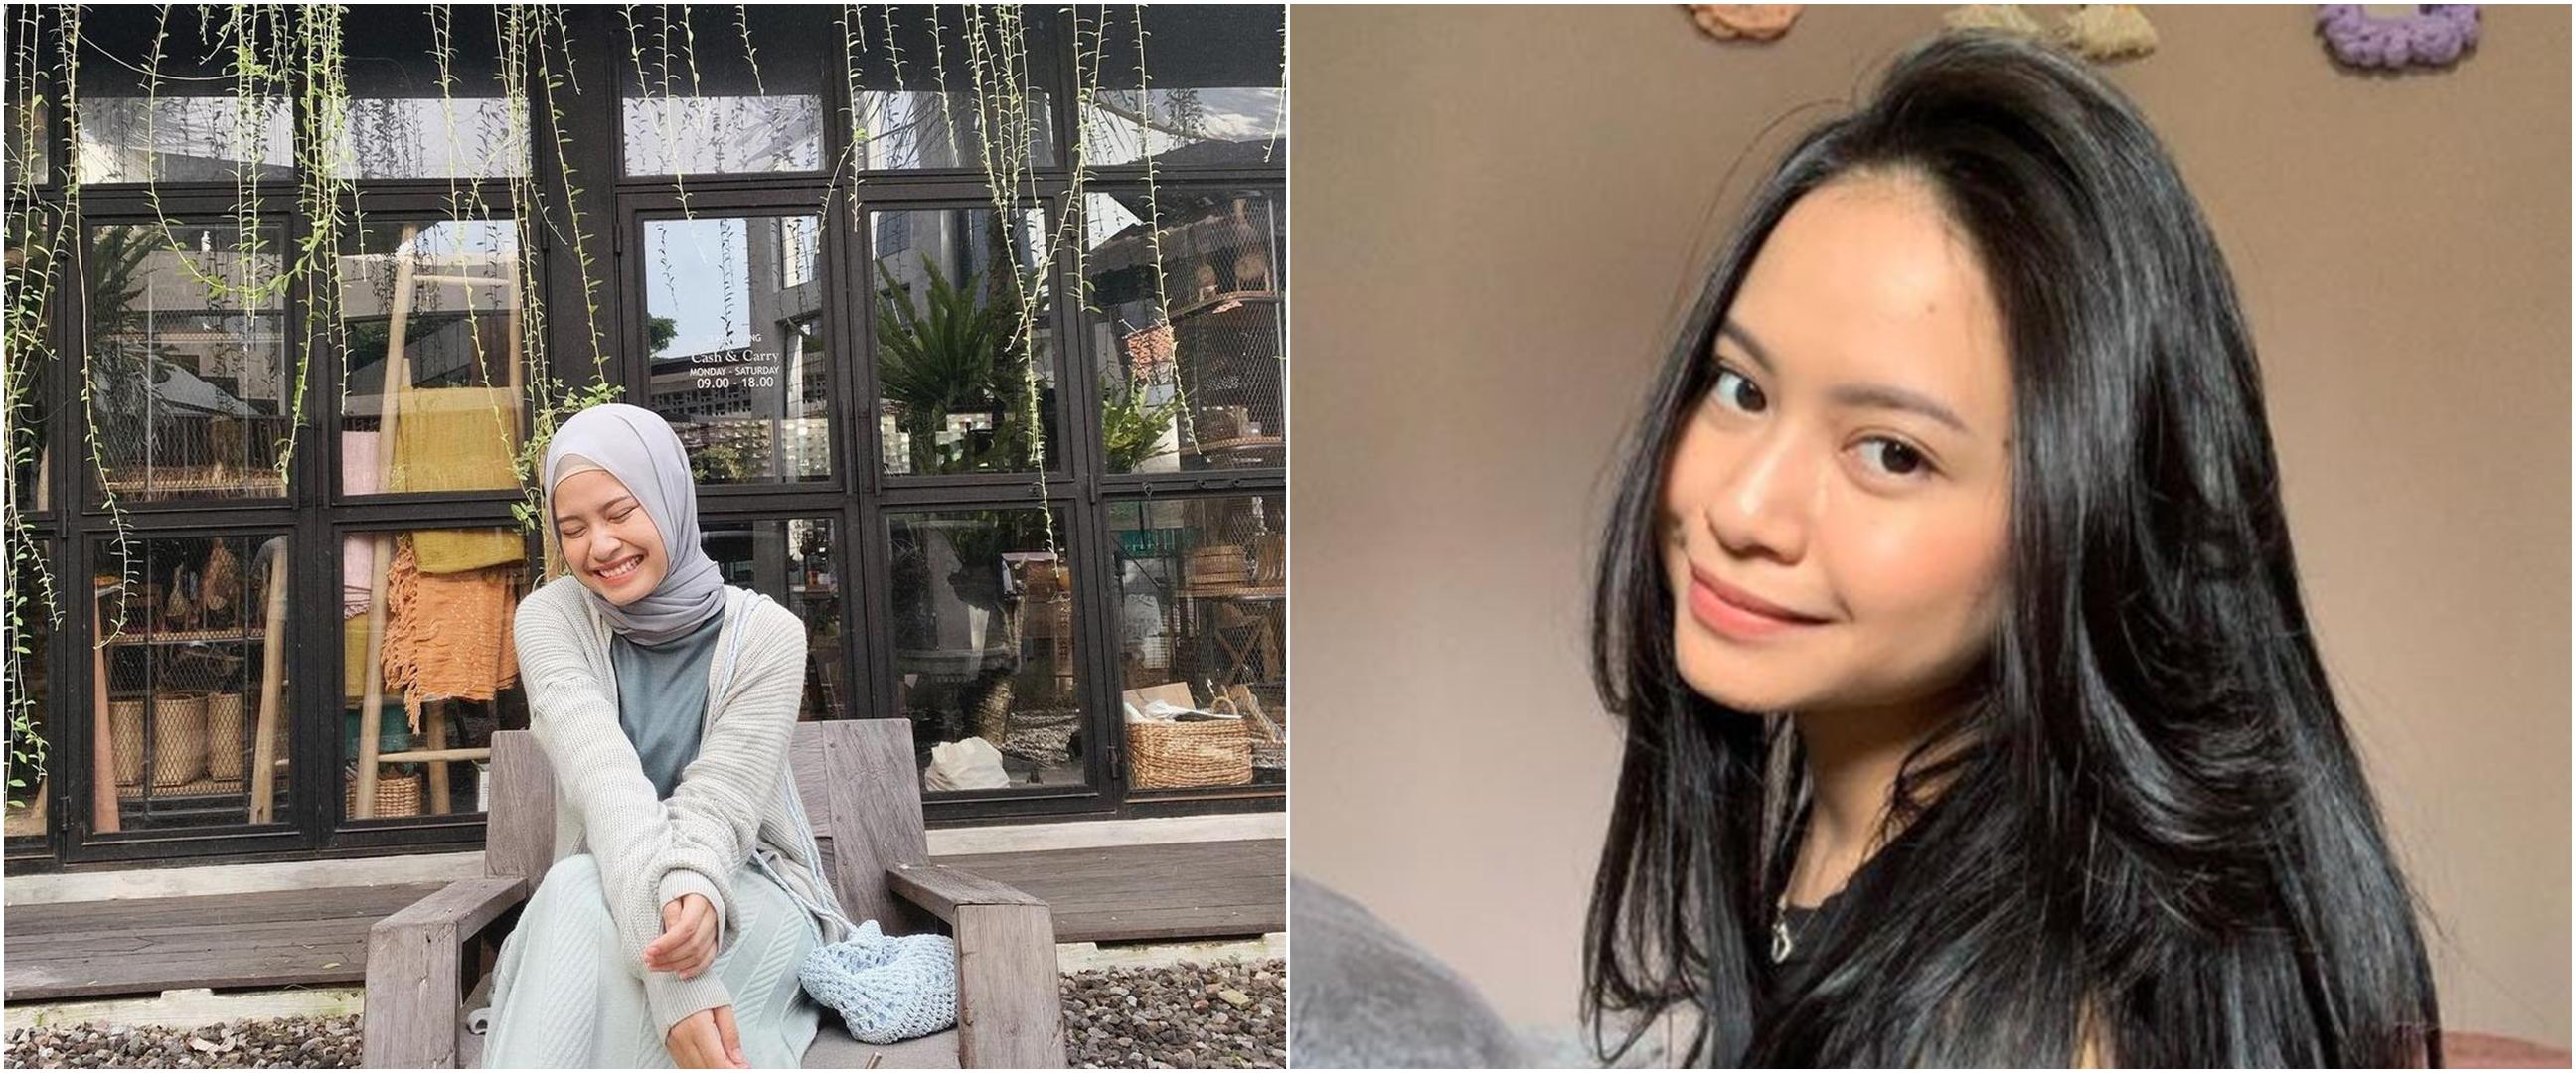 8 Potret Hanggini 'Ustad Milenial' kenakan hijab, pesonanya manglingi